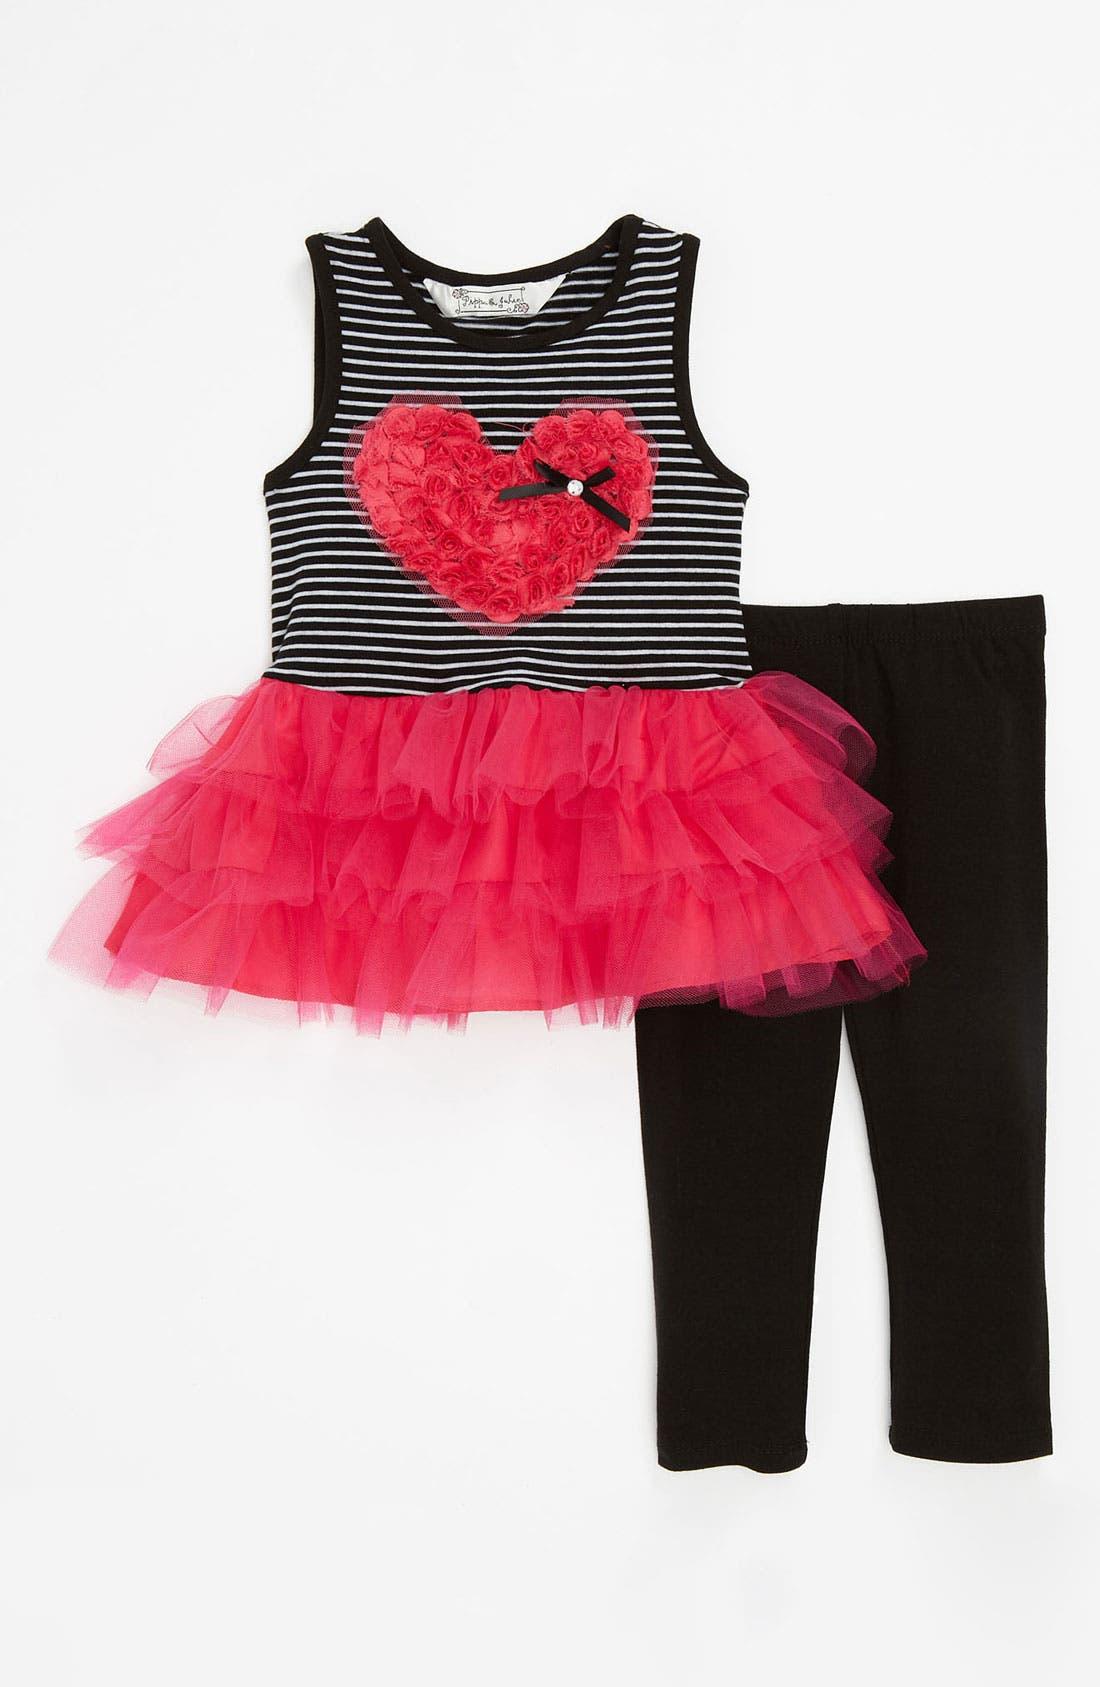 Alternate Image 1 Selected - Pippa & Julie Soutache Heart Top & Leggings (Toddler)